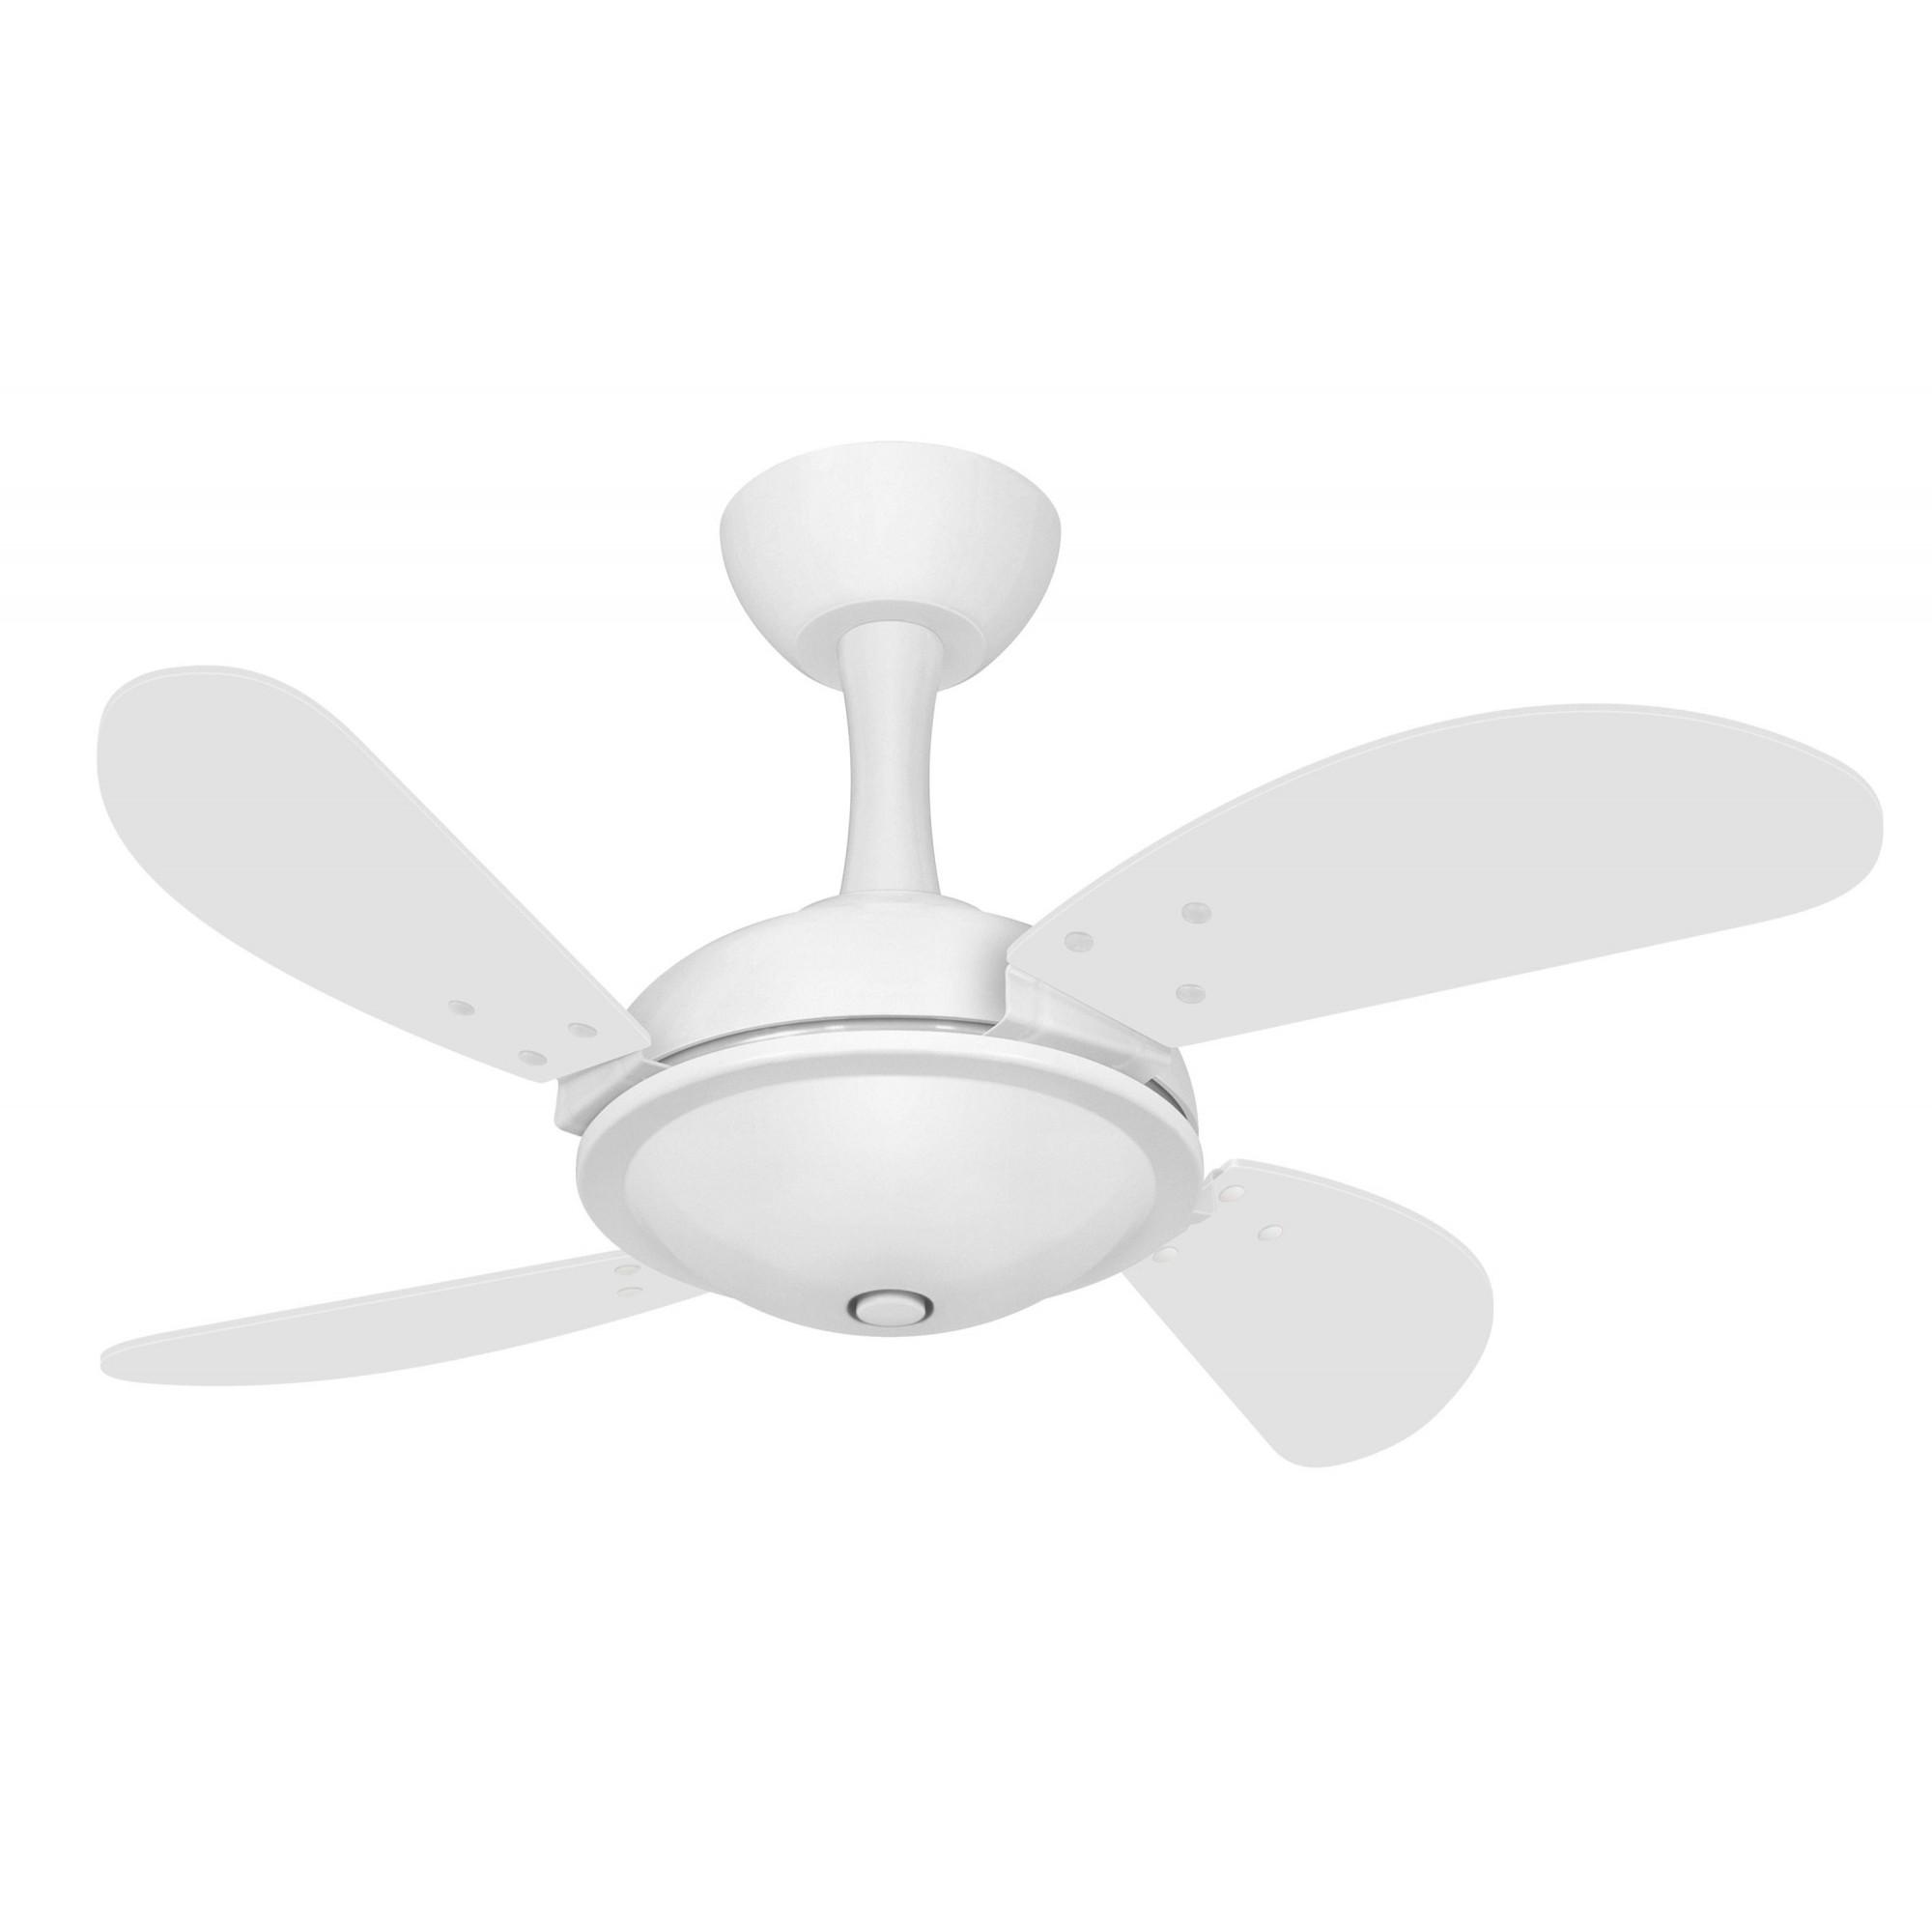 Ventilador Teto Ventax Office Mini Fly Branco 4Pás MDF 220V